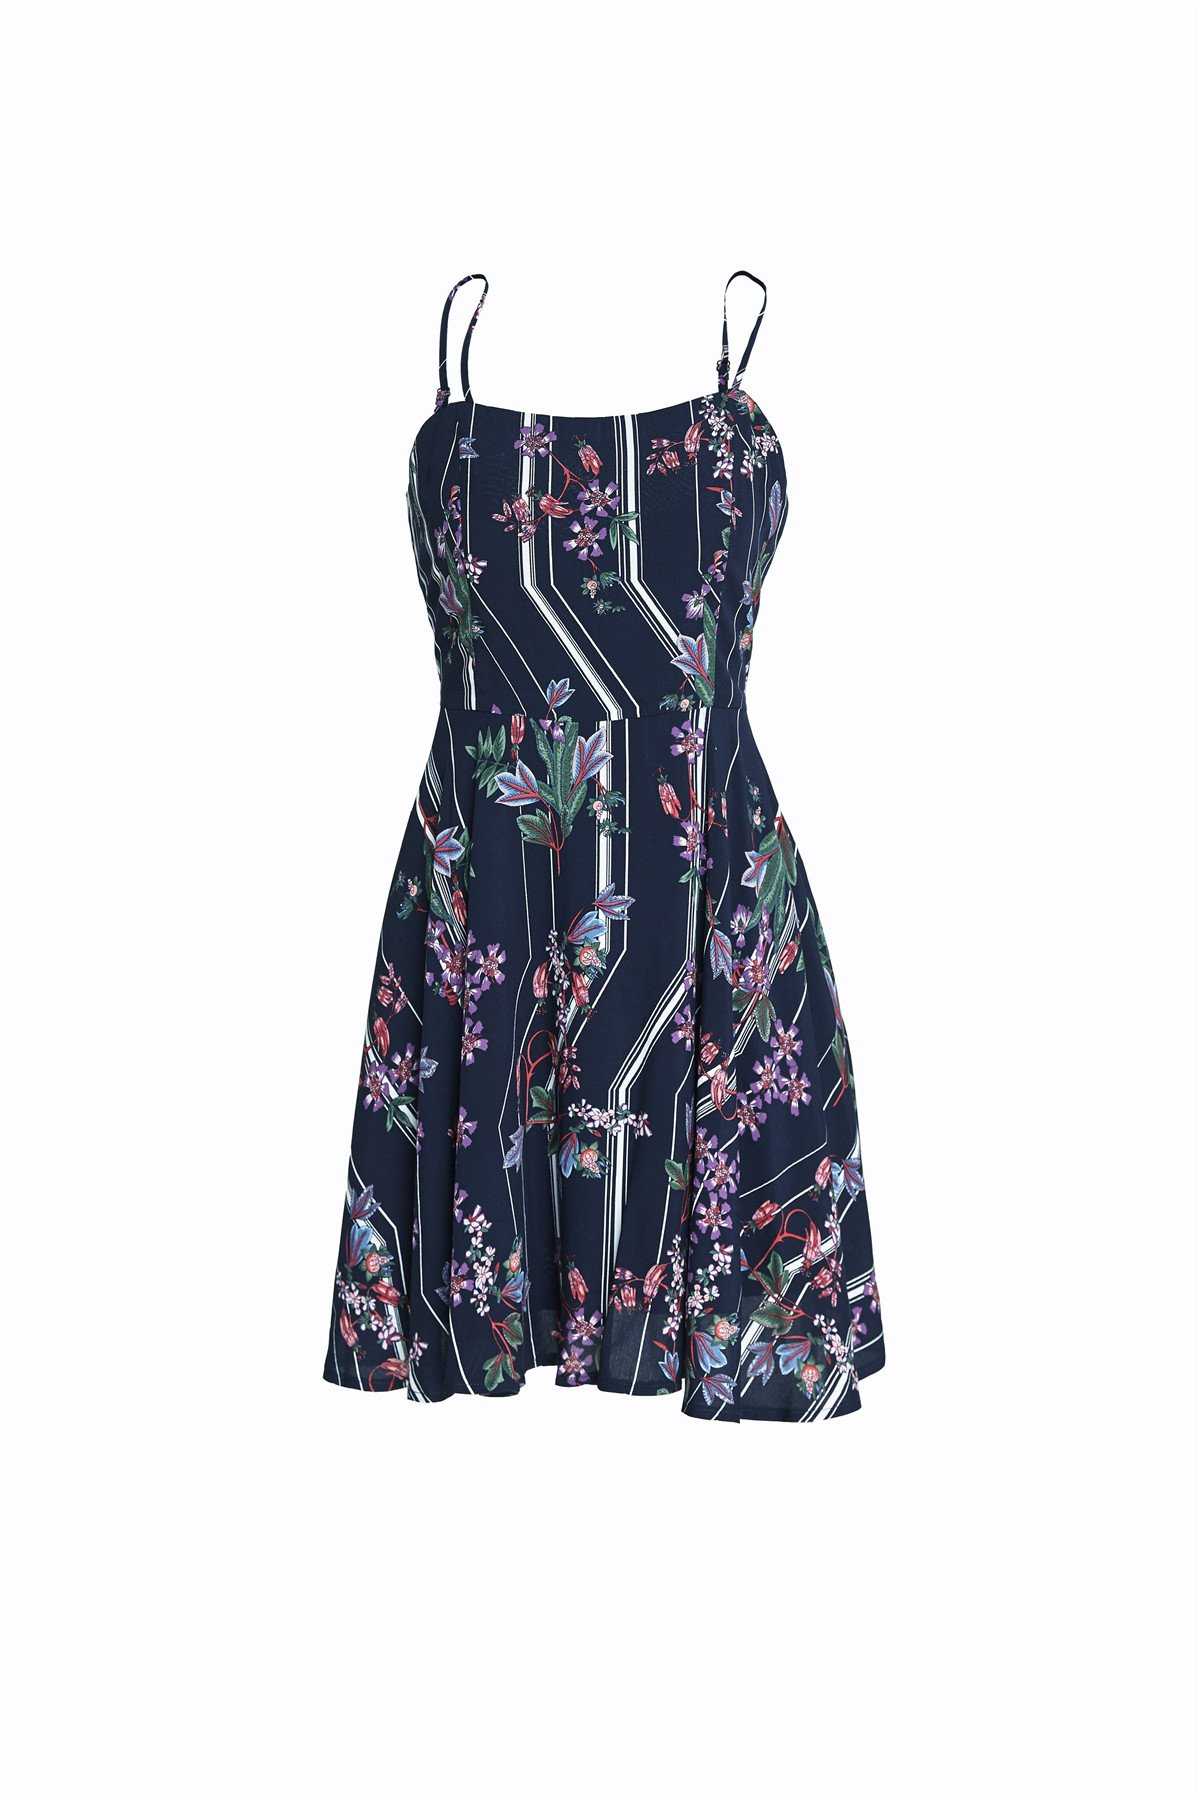 Women's Spaghetti Strap Mini Dress